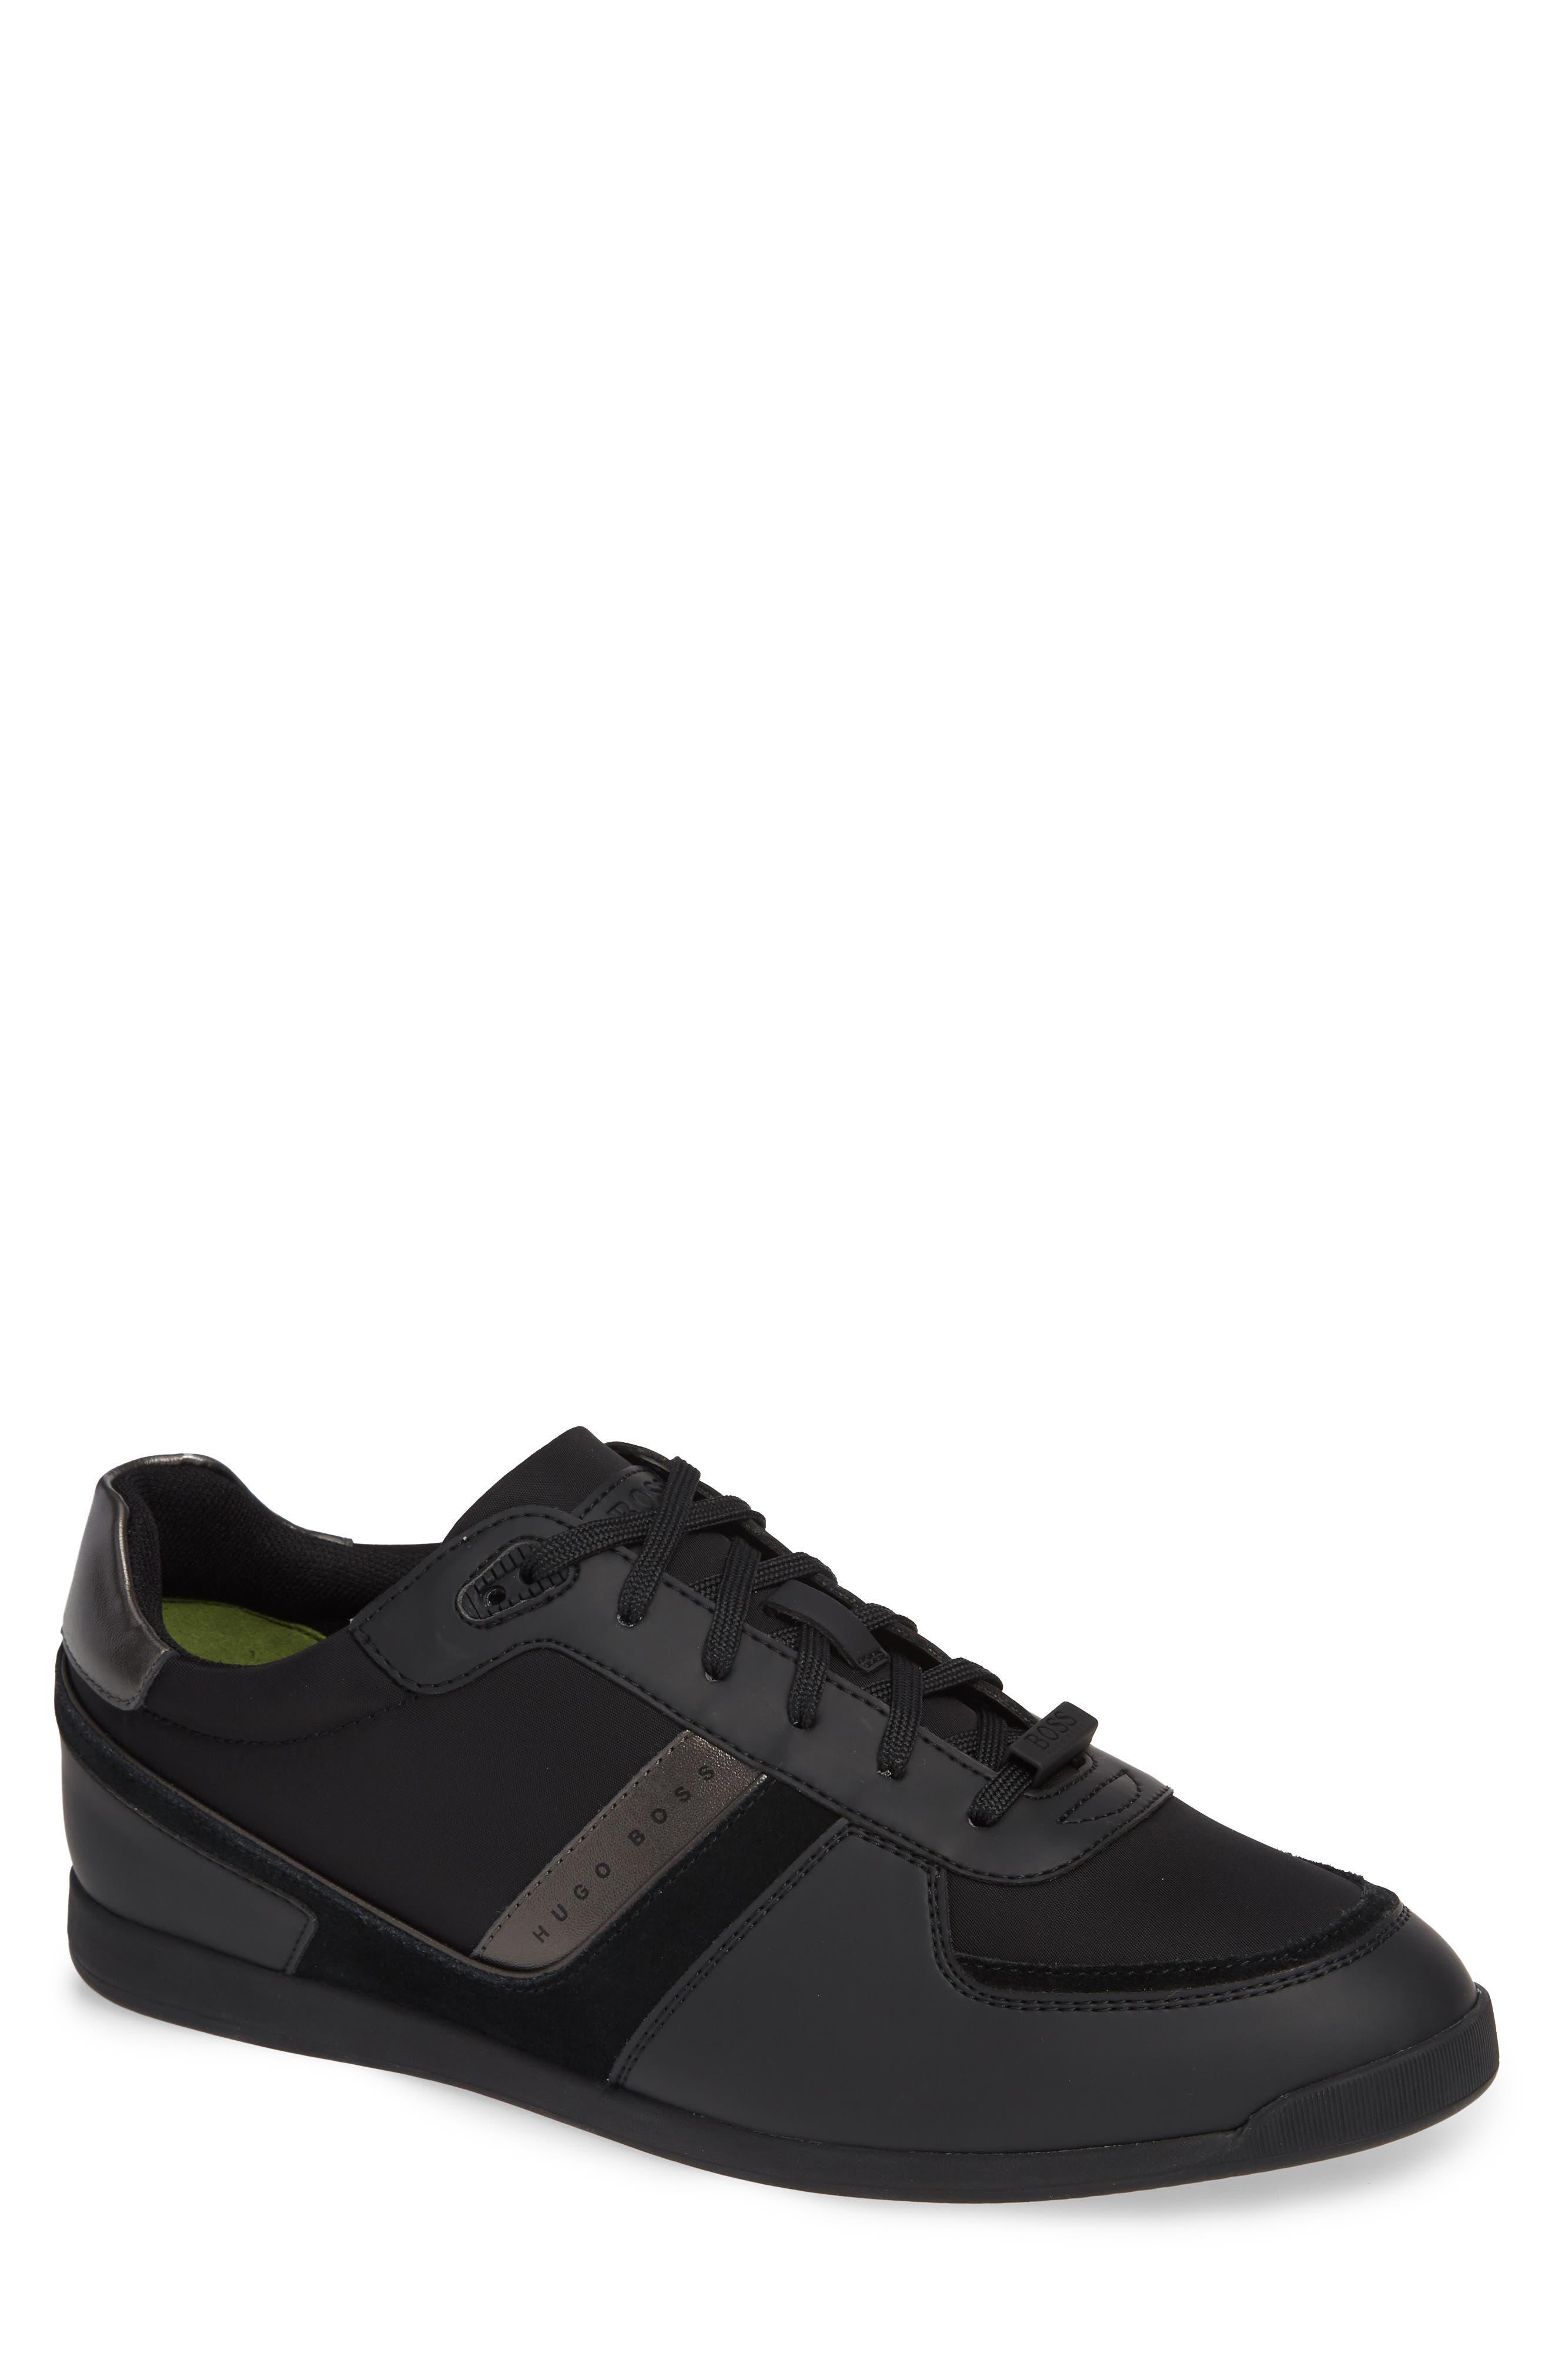 Maze Sneaker,                         Main,                         color, BLACK